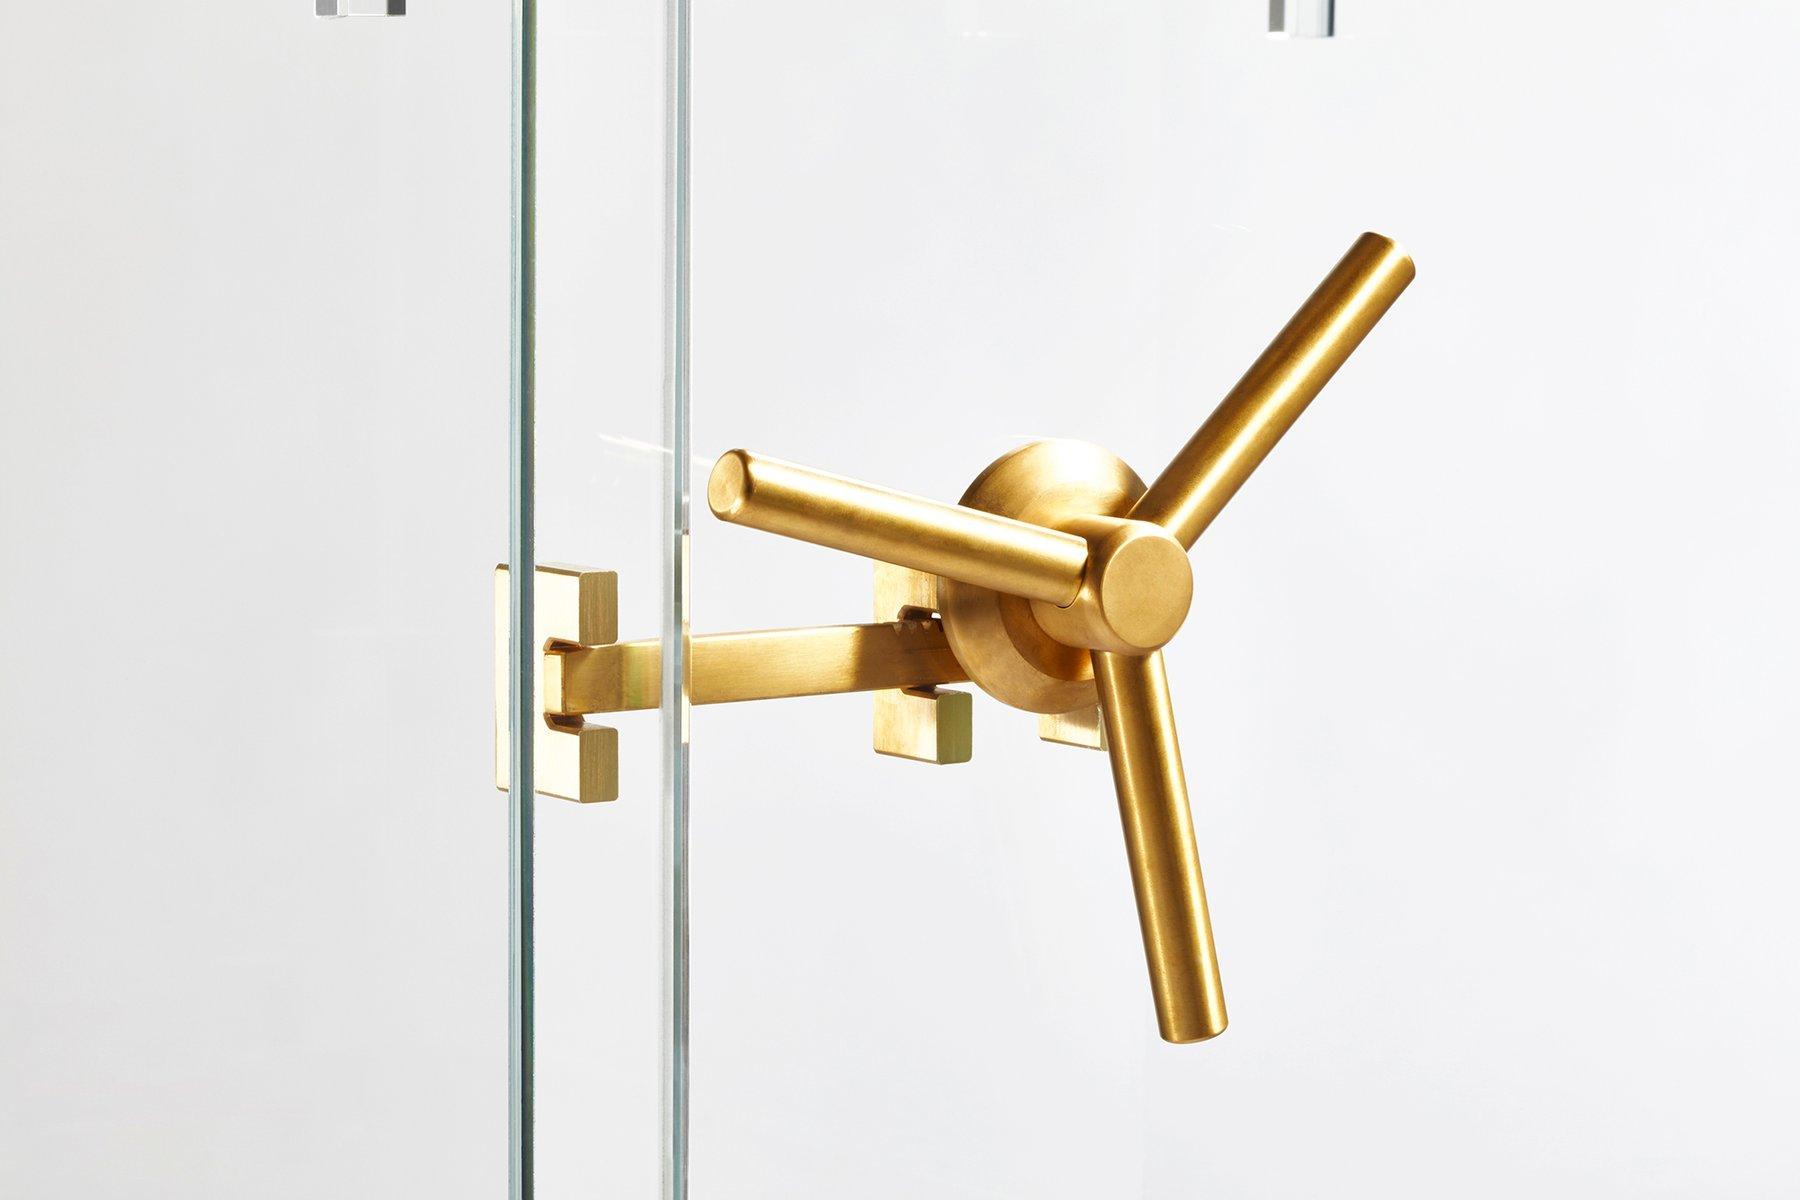 kristallglas tresor von ctrlzak f r editions milano 2015 bei pamono kaufen. Black Bedroom Furniture Sets. Home Design Ideas